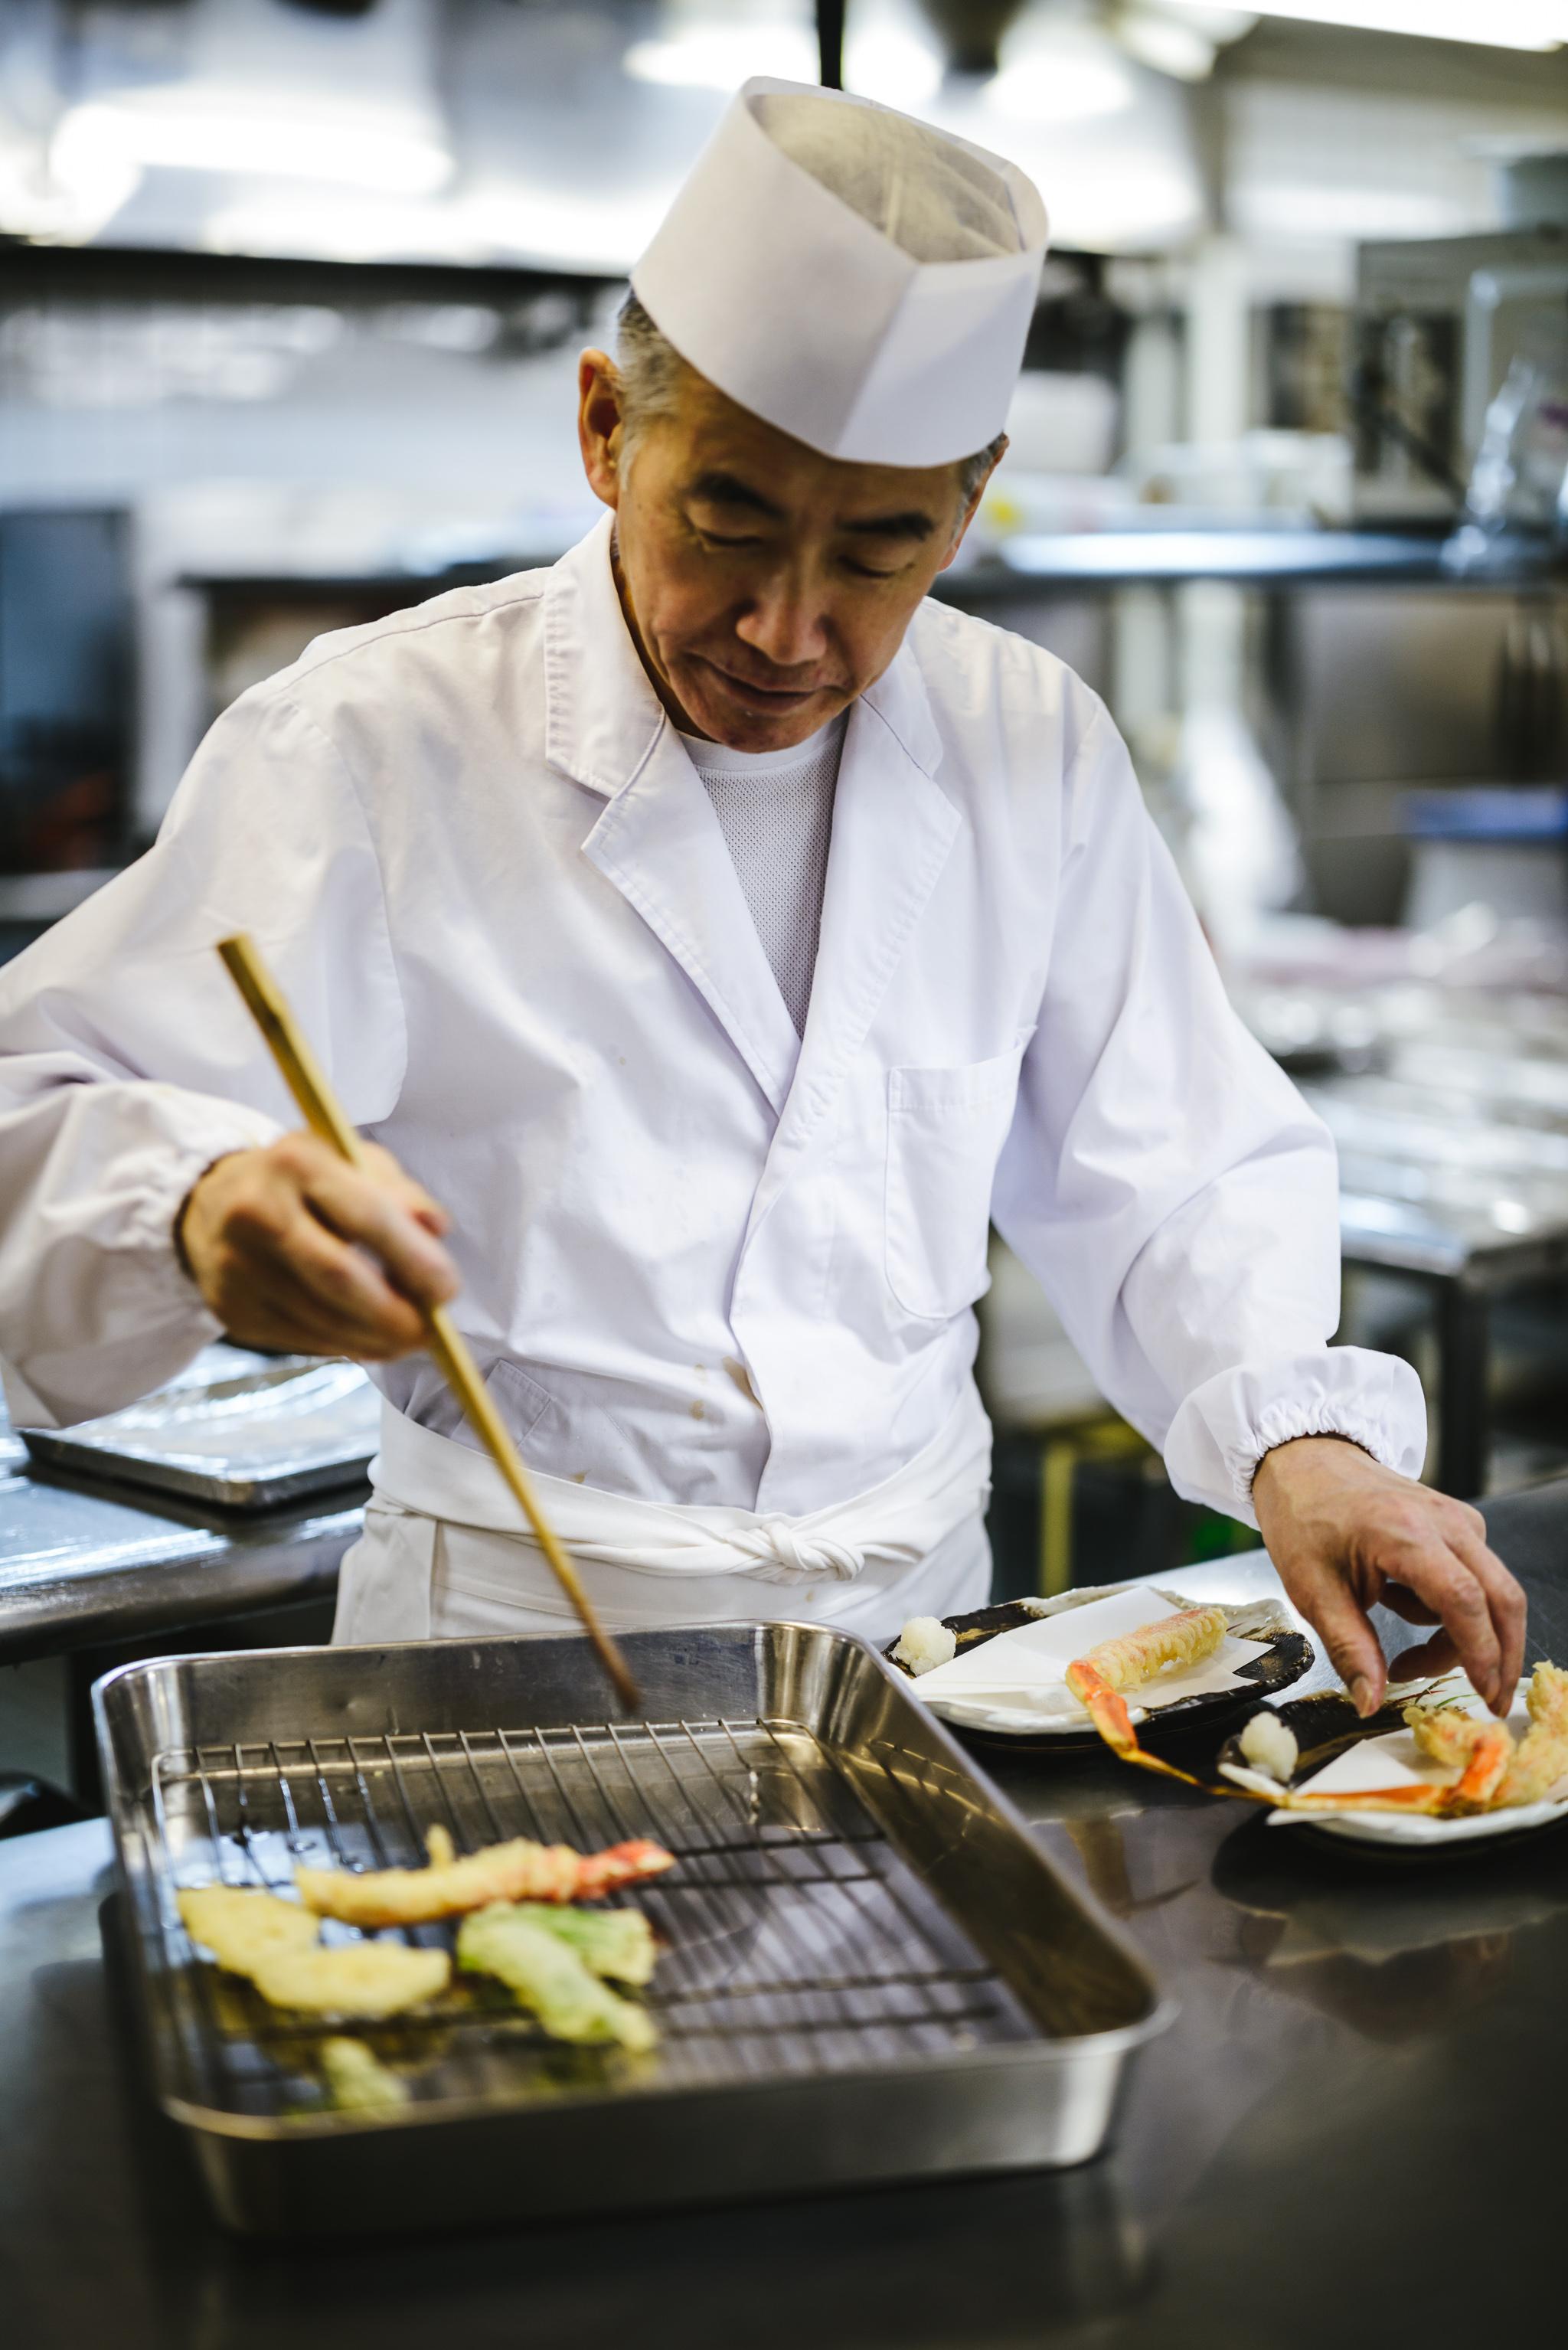 chef fries tempura